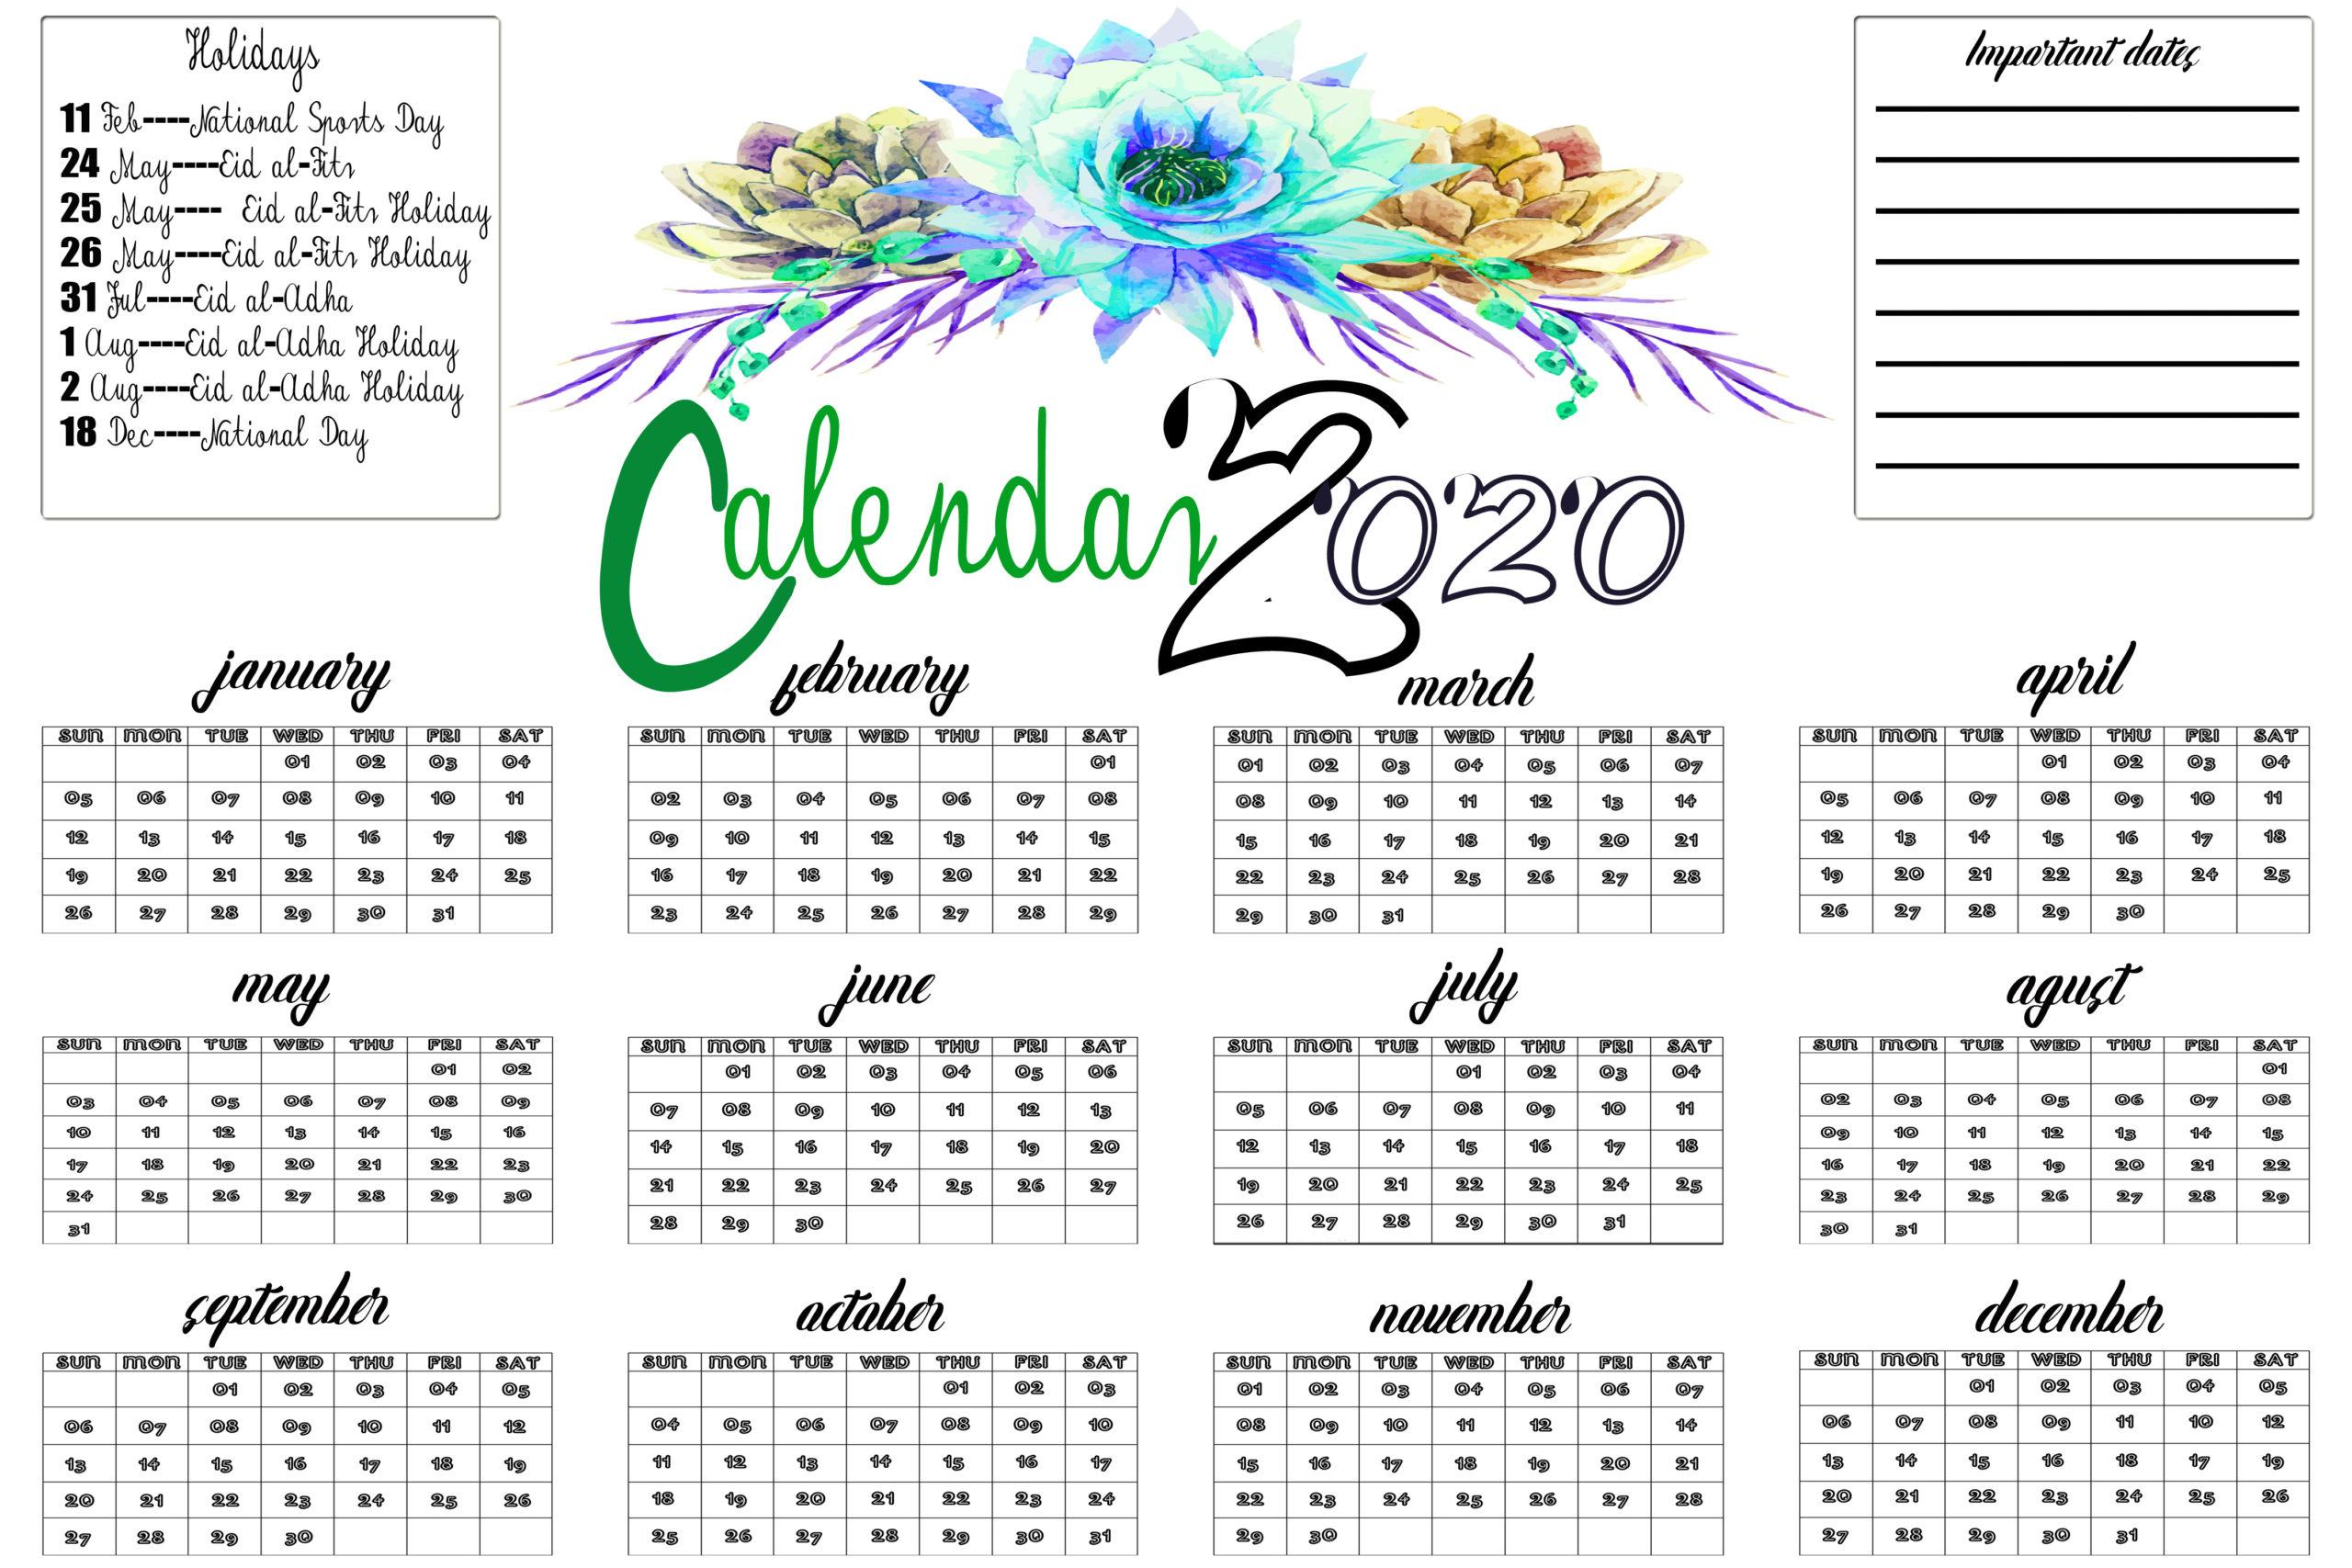 Qatar 2020 Calendar With Holiday Printable Template Download within 2020 Calendar Qatar Printable